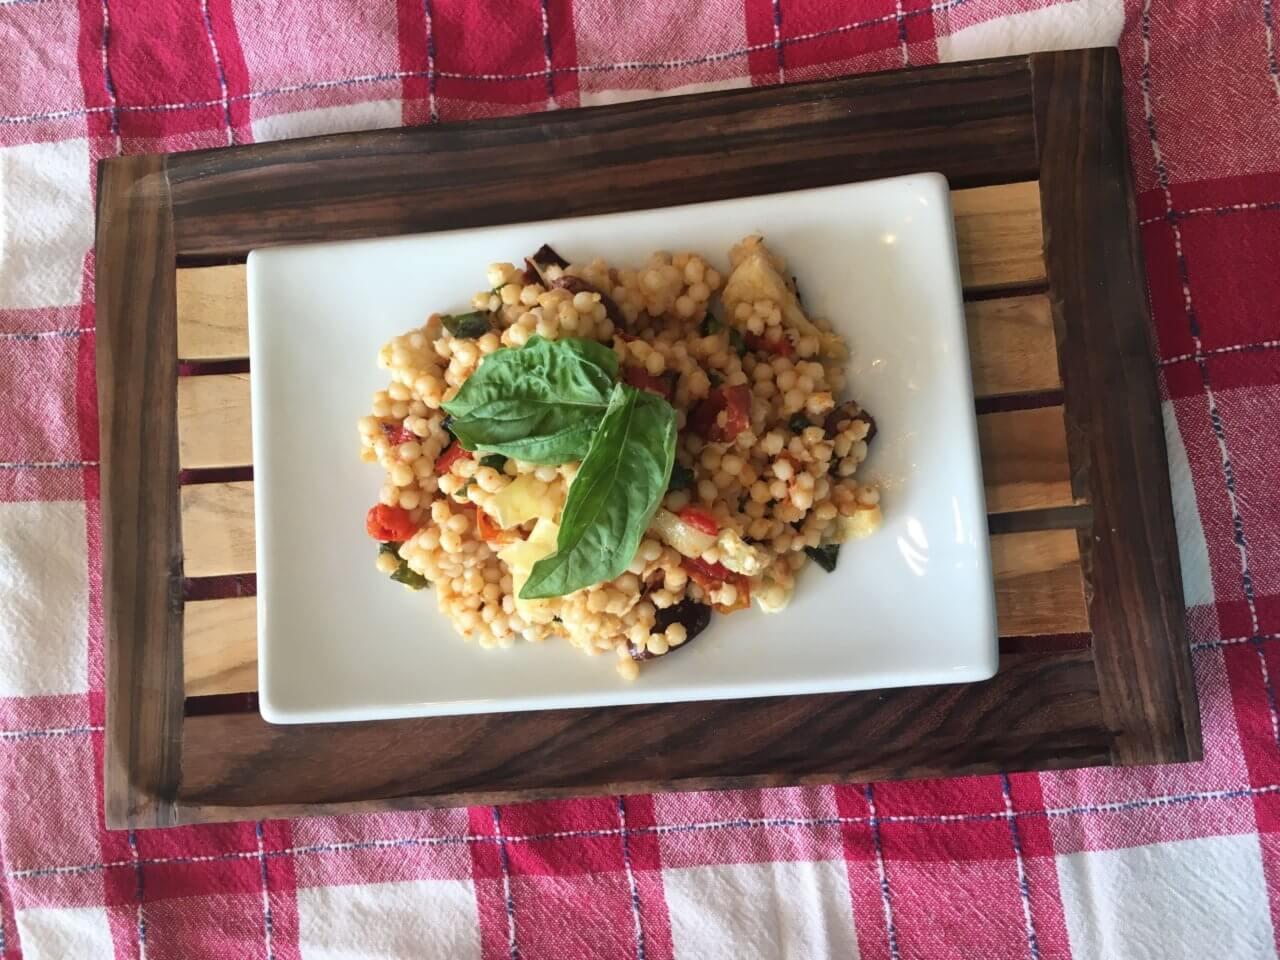 Mediterannean-Pearl-Couscous-Salad-Plated-min-1280x960.jpg